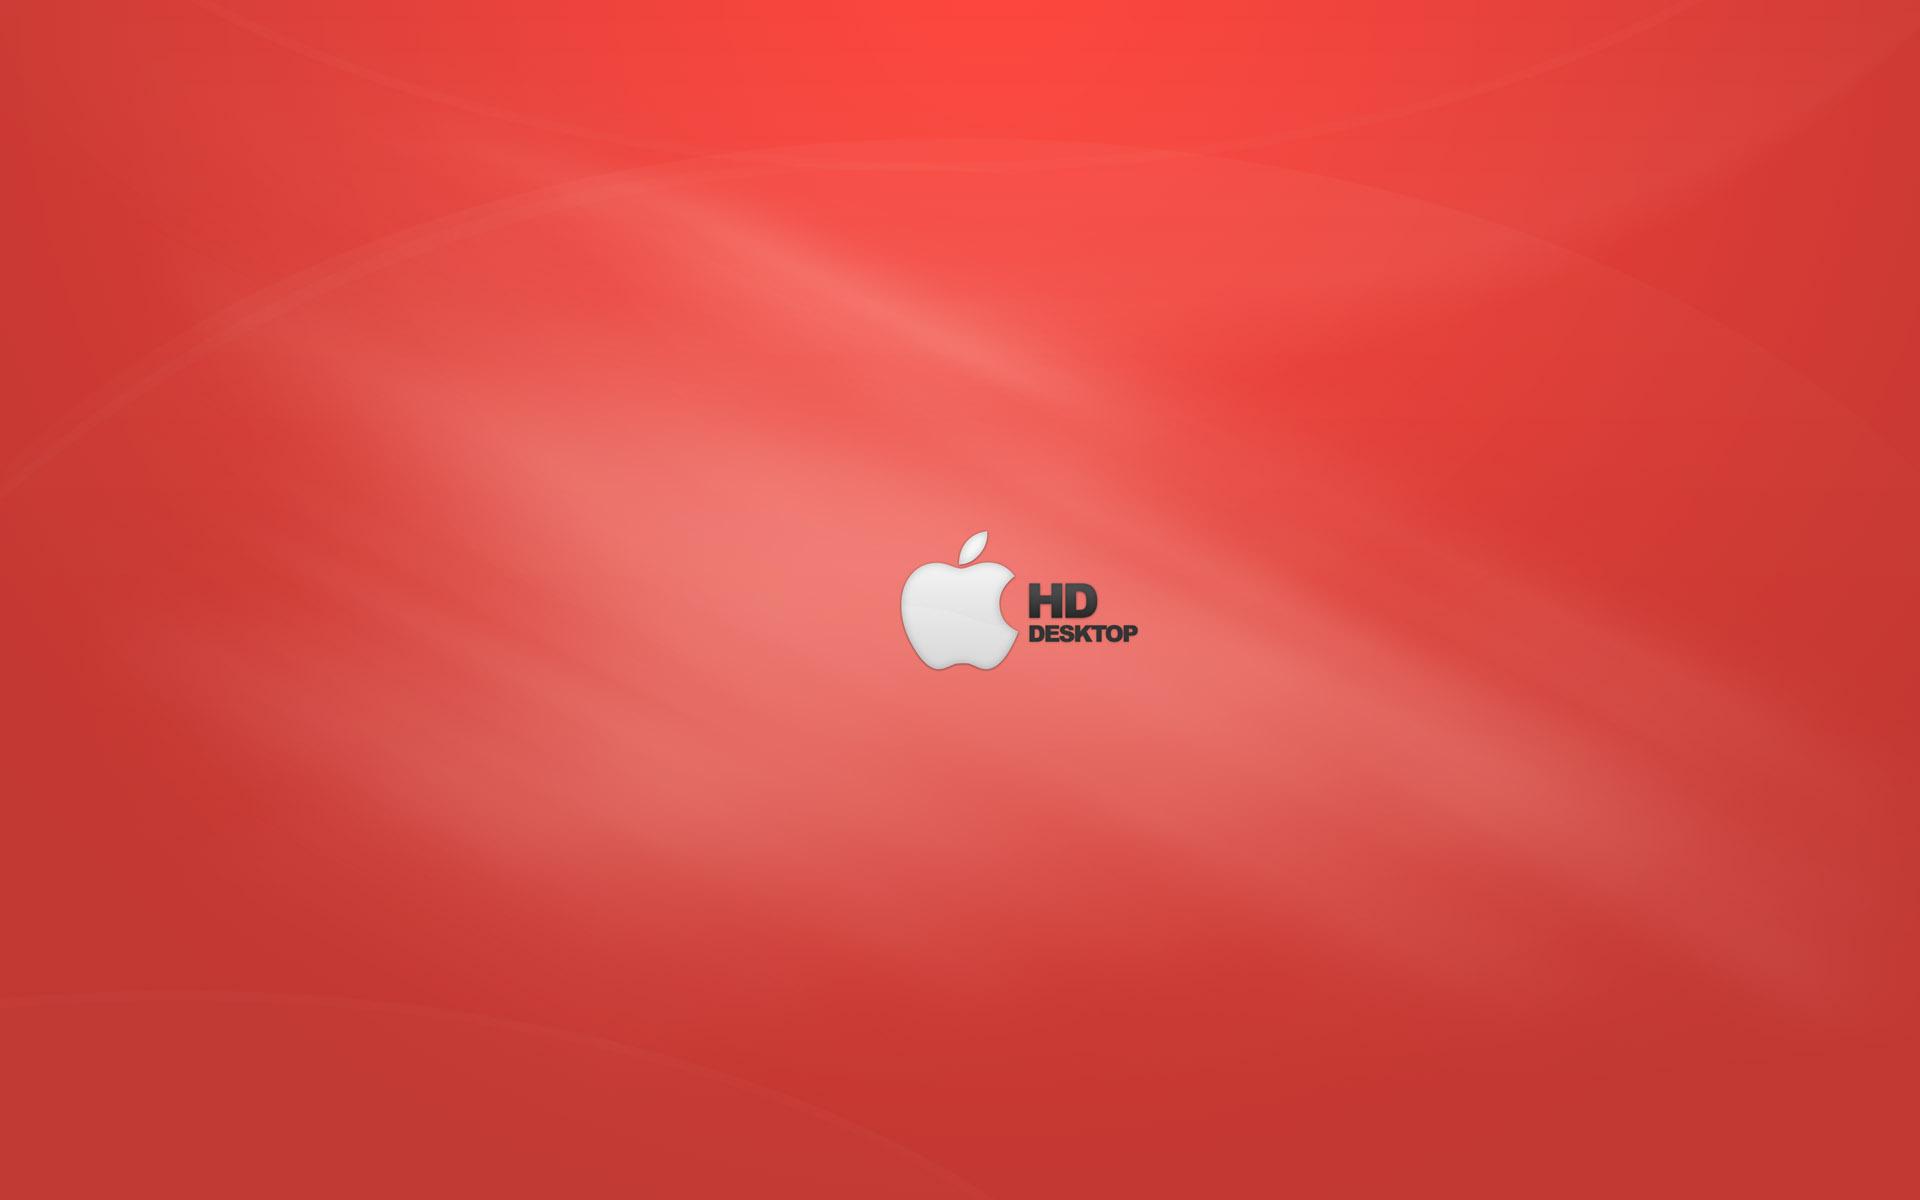 Hdデスクトップ アップルの壁紙のhd 19x10 Wallpapertip